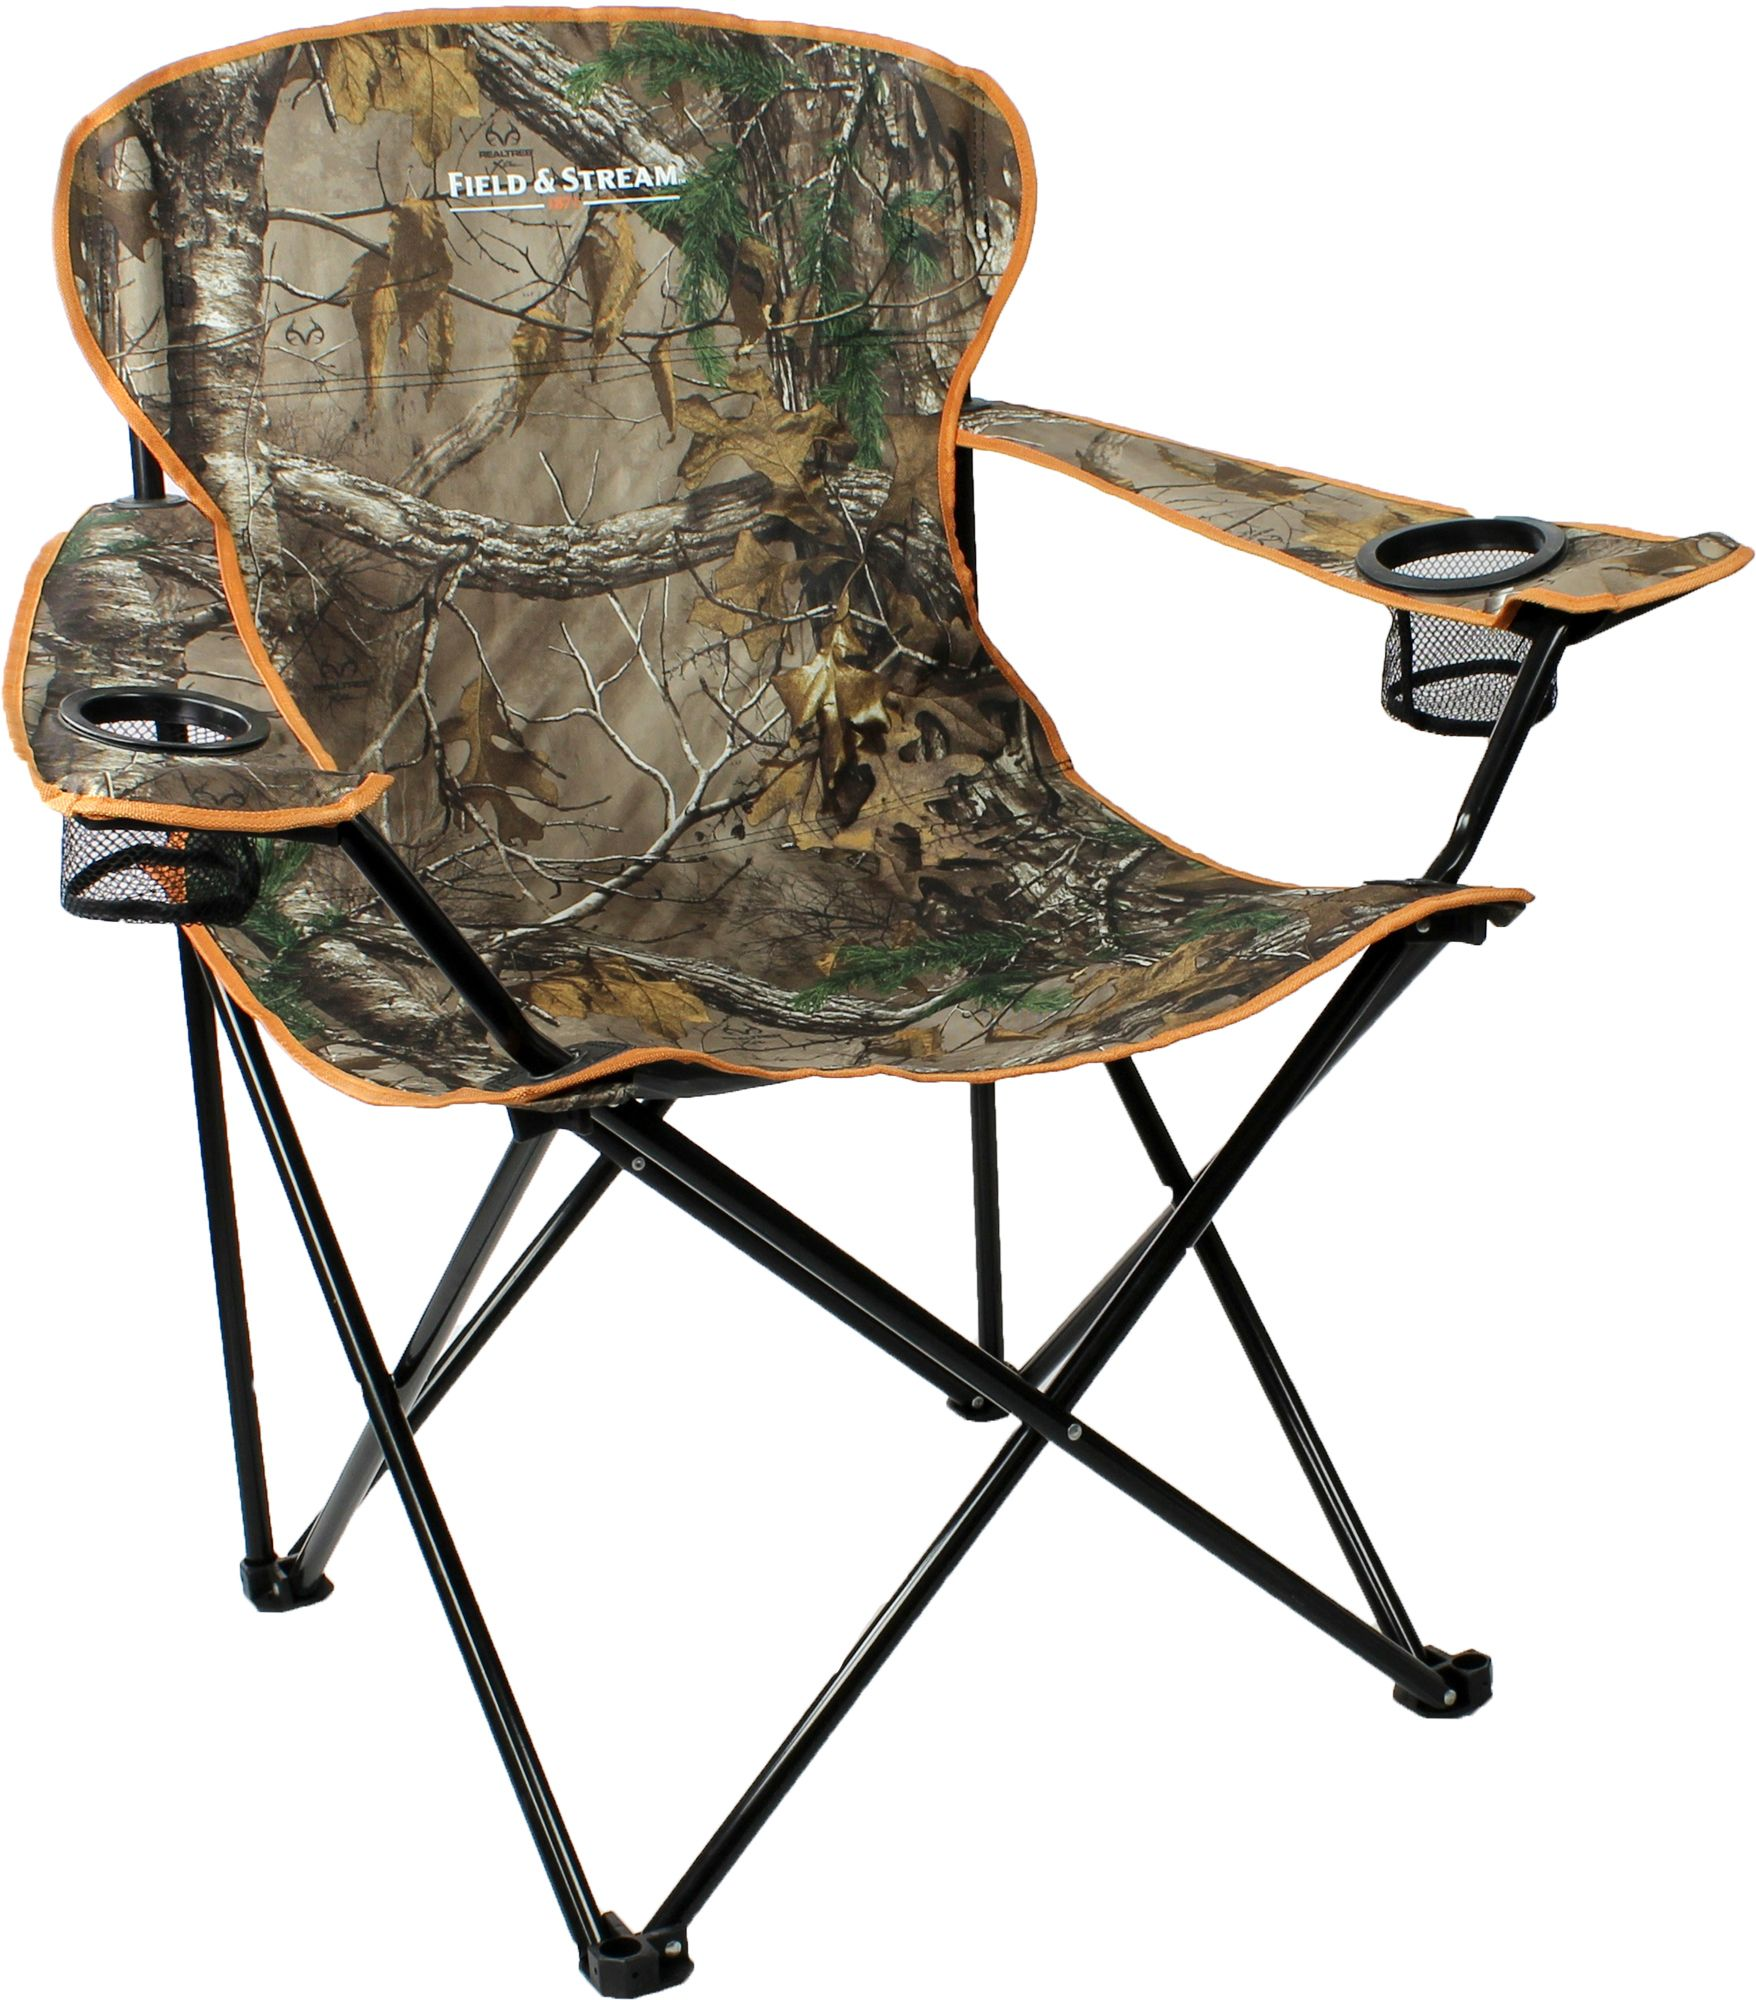 Field & Stream Camo Camp Chair